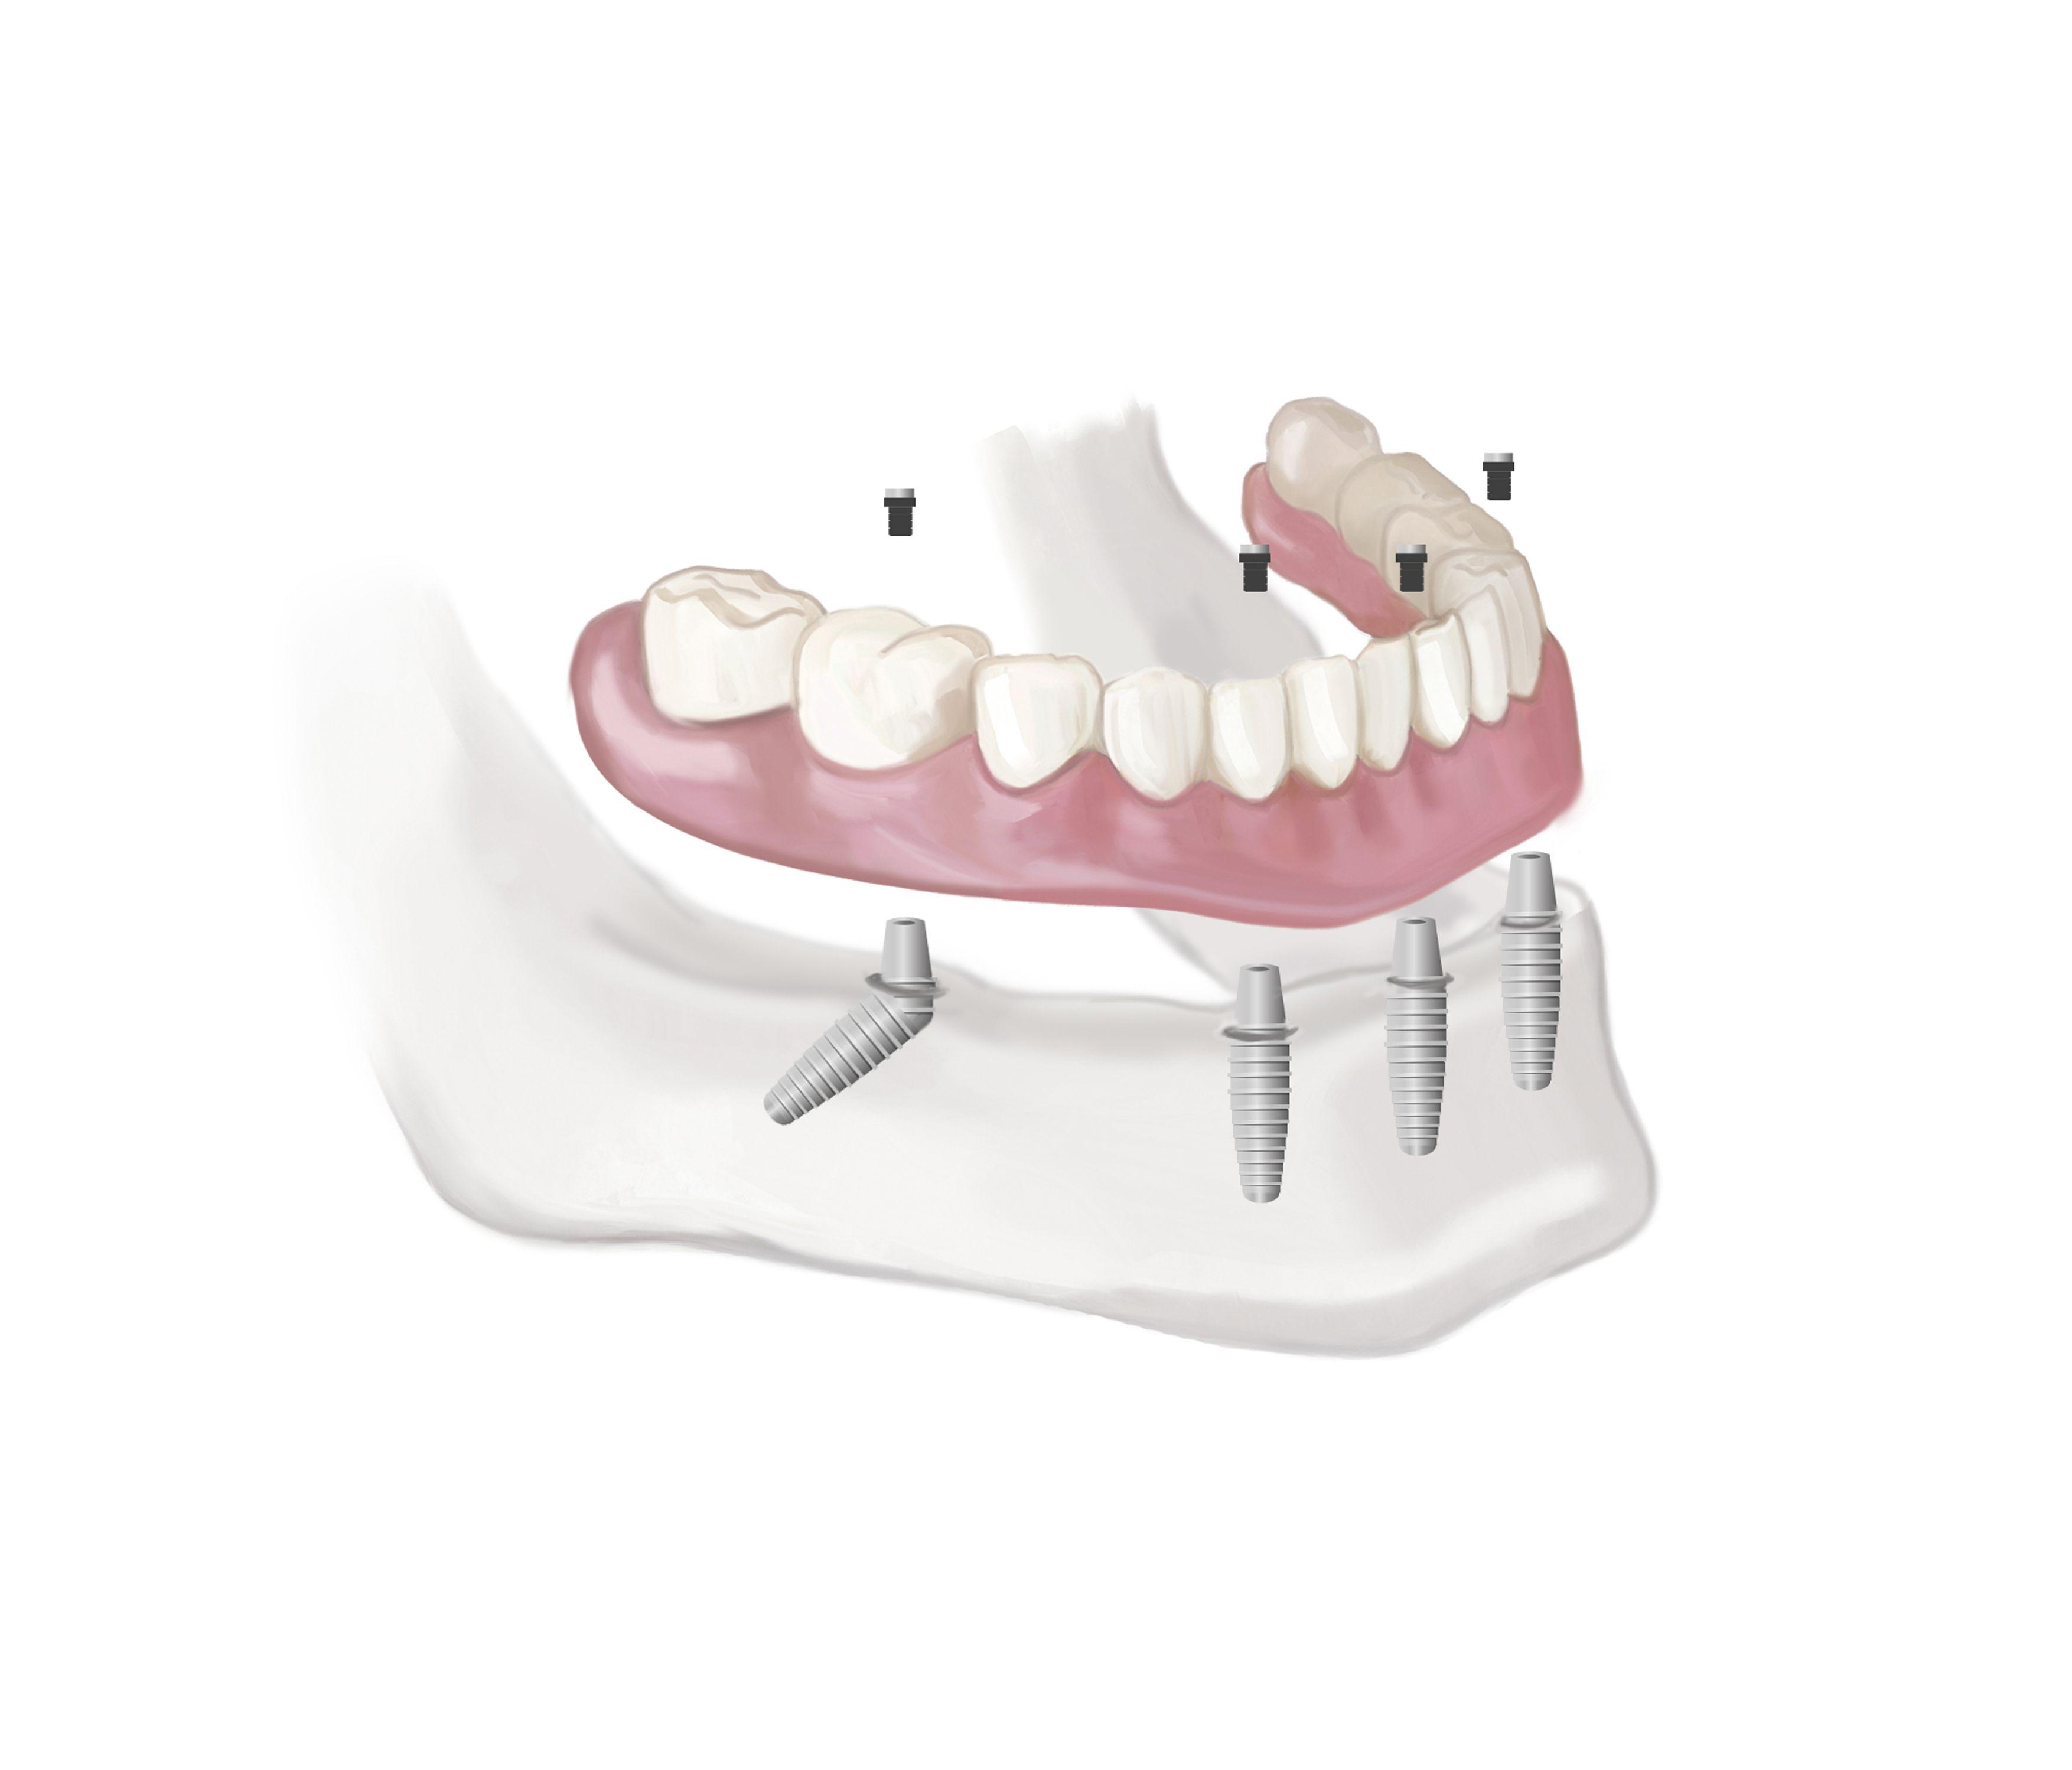 Dental implants edmonton httpwwwshoredentureclinic